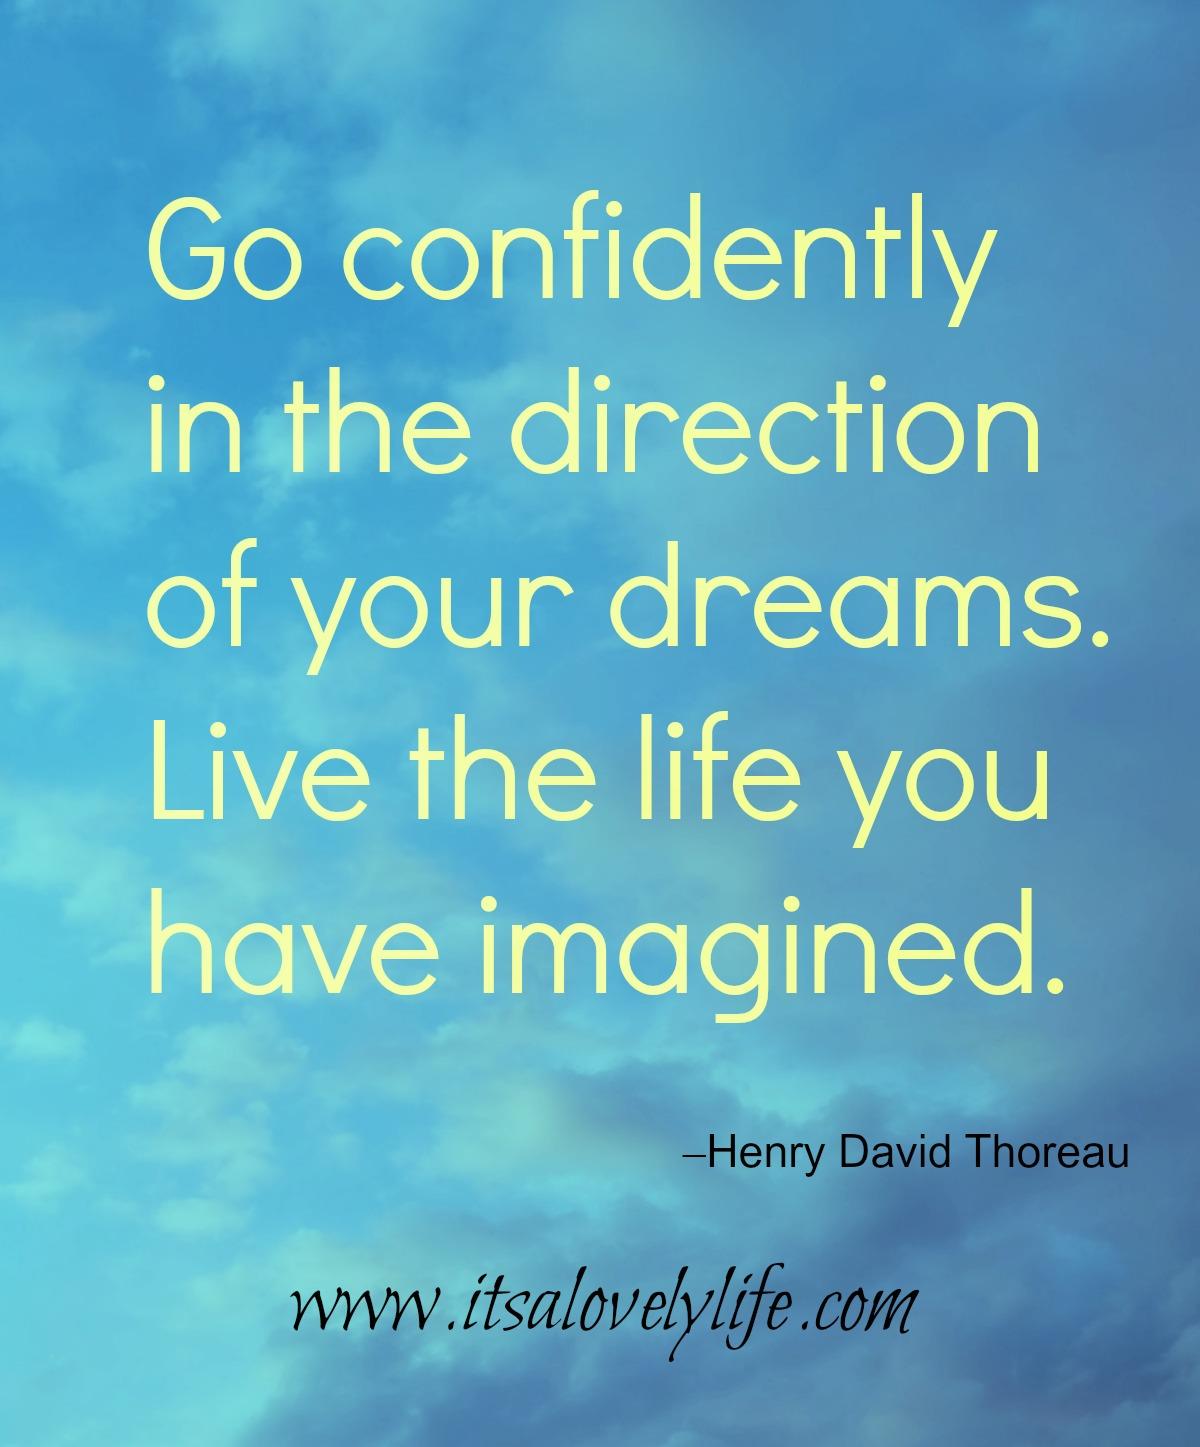 Dreams Come True Quotes. QuotesGram